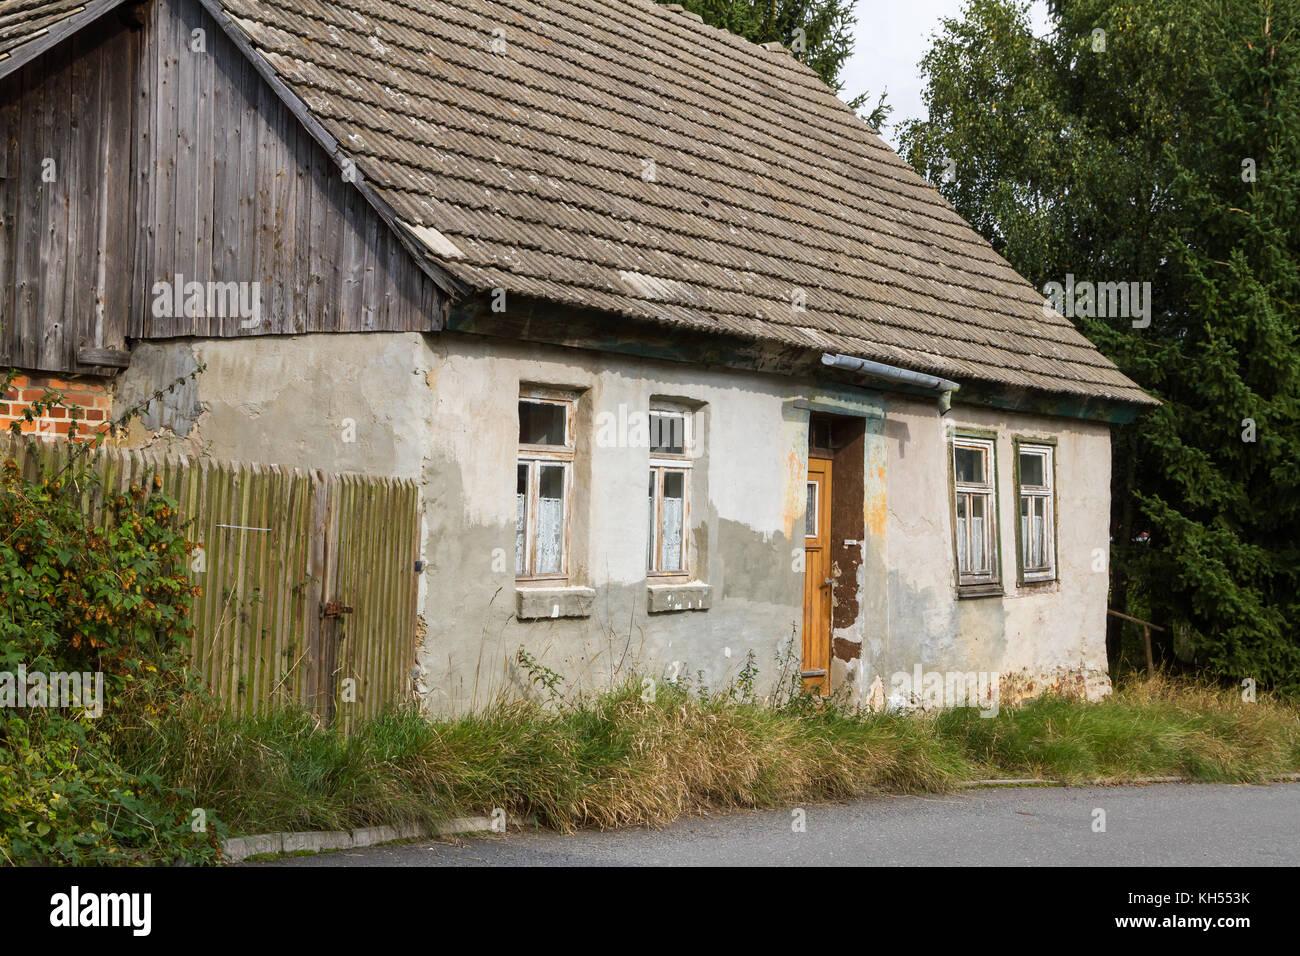 Kleines Haus Stock Photos & Kleines Haus Stock Images - Alamy